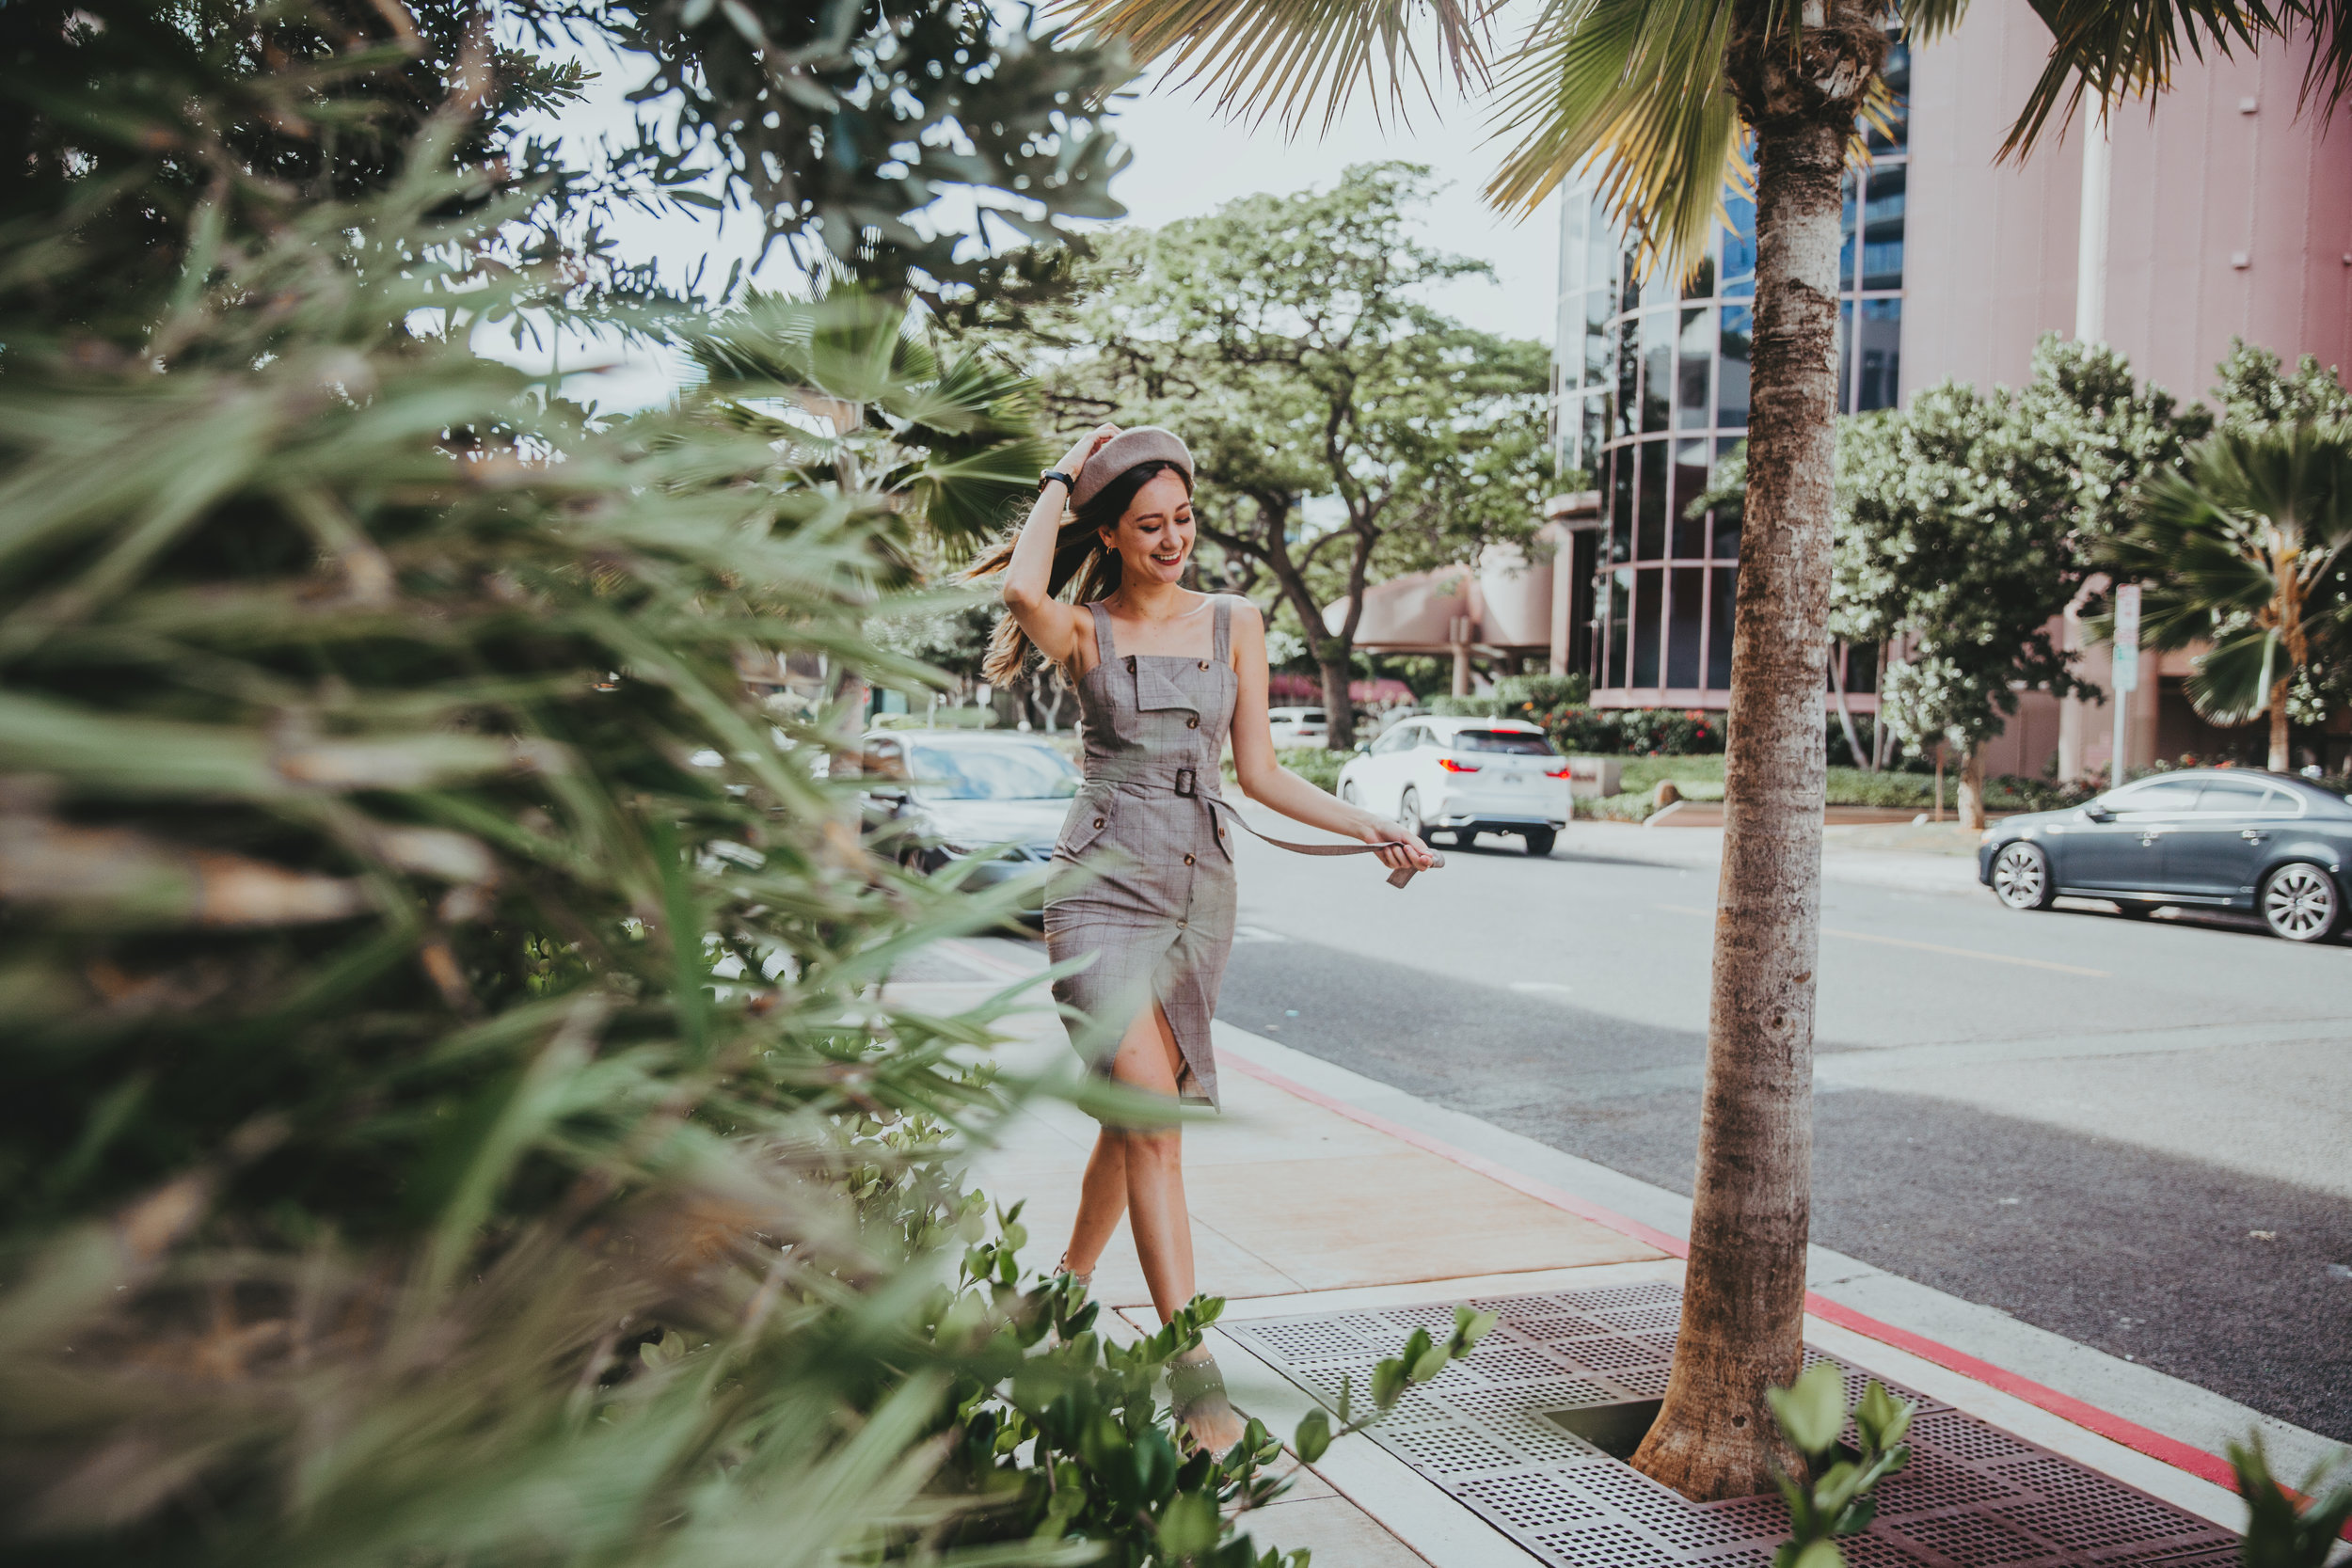 Hawai'i photographer, Oahu photographer, honolulu photographer, genkiphotos, genkimedia, hawaii urban photography, Hawaii Sunset, love yourself,hawaii lifestyle photography